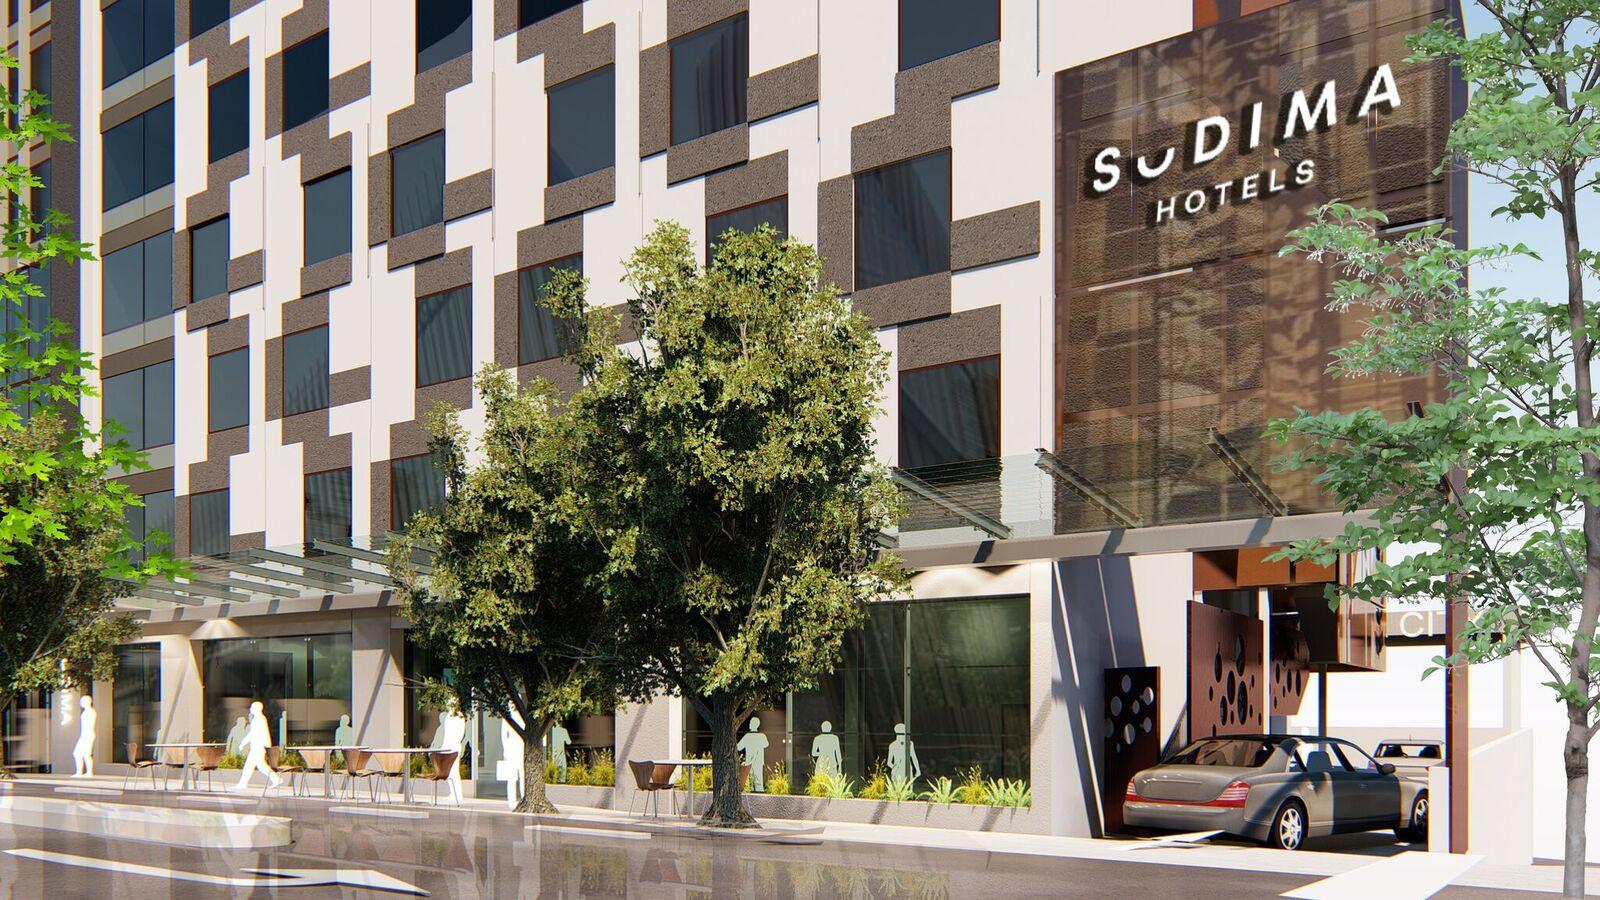 Artist's impression of the Auckland CBD Sudima hotel exterior.